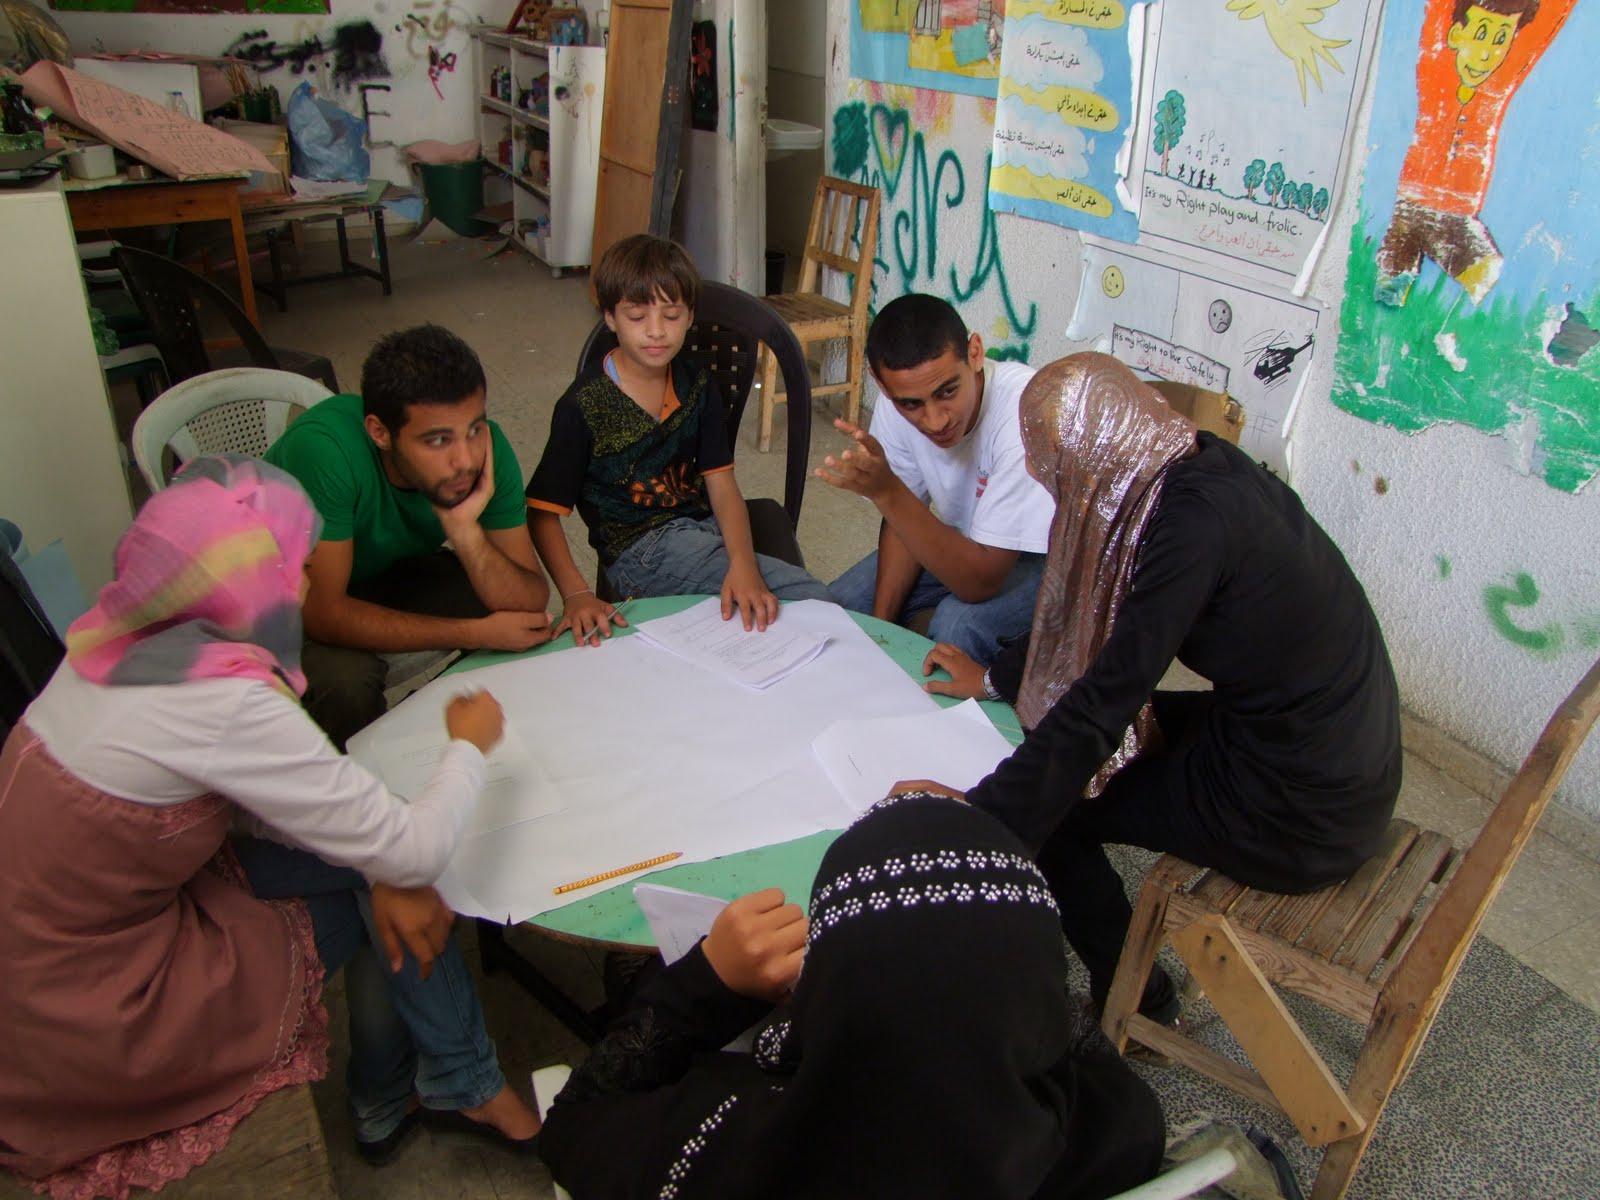 Gaza_youth_workshop.jpg